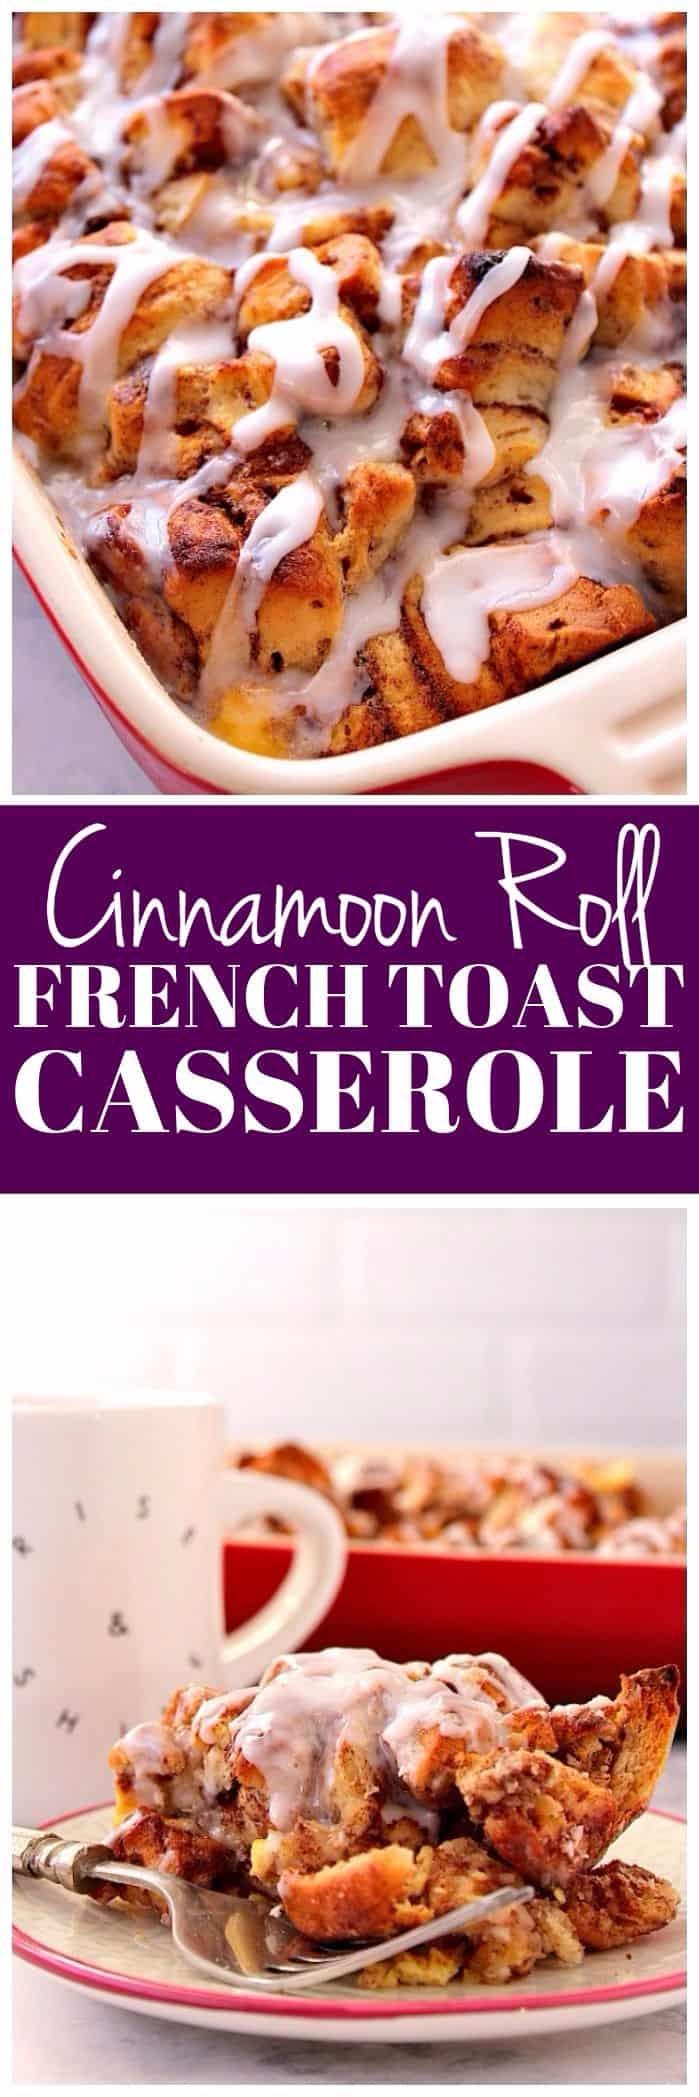 cinnamon roll French toast casserole recipe long1 Cinnamon Roll French Toast Casserole Recipe